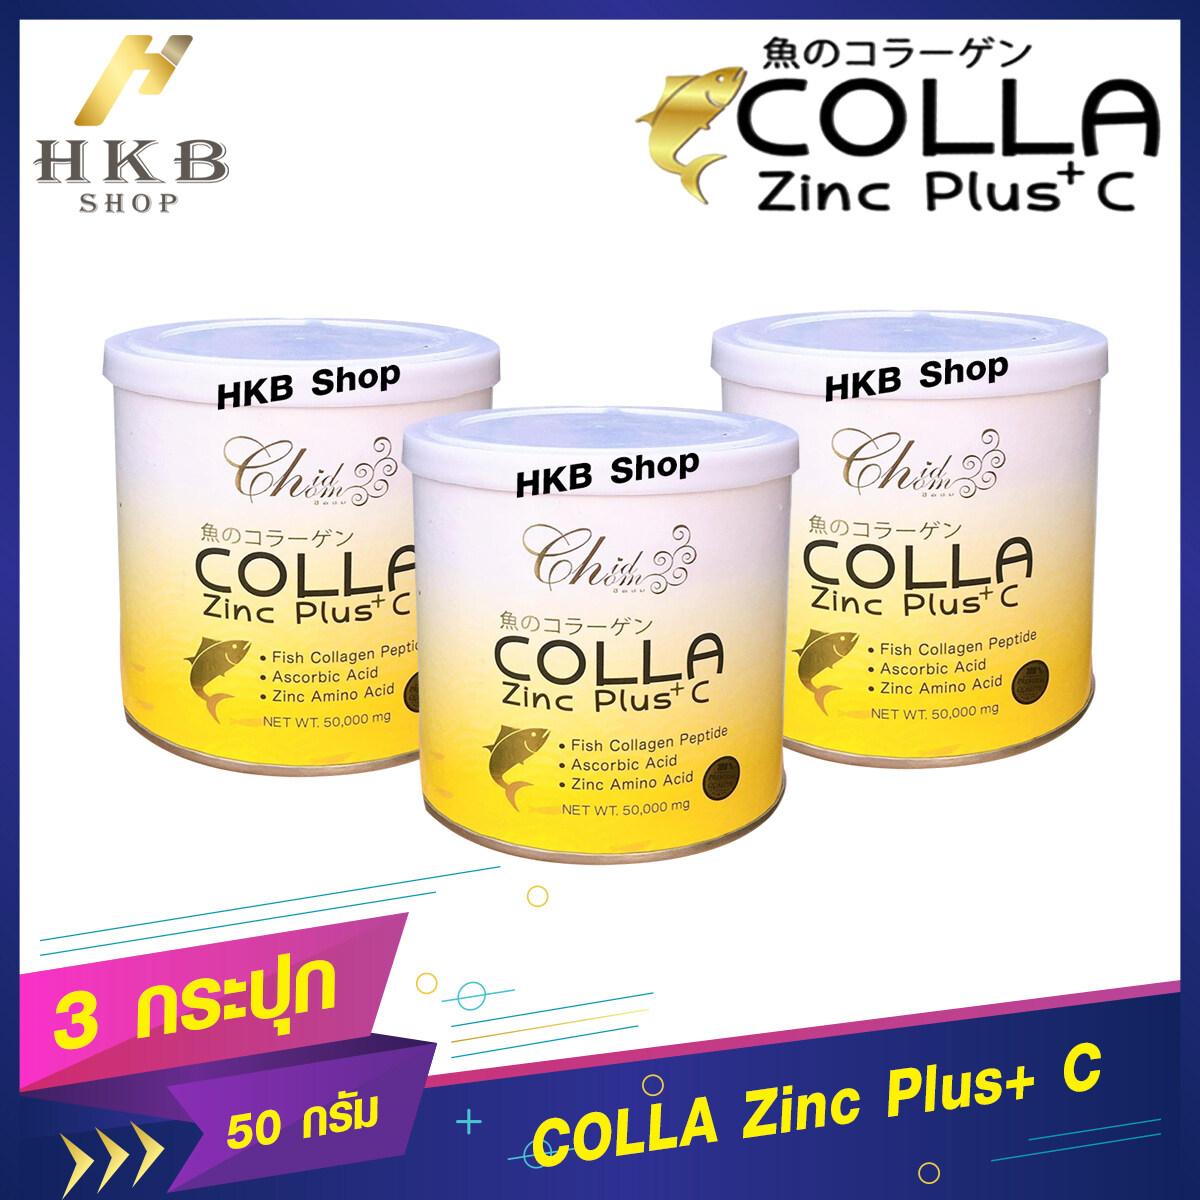 ⚡️3กระปุก/50กรัม⚡️ Colla Zinc Plus+ C คอลลา ซิงค์ พลัส ซี คอลลาเจน ซิงค์ ผสม วิตามินซี By Hkb Shop.